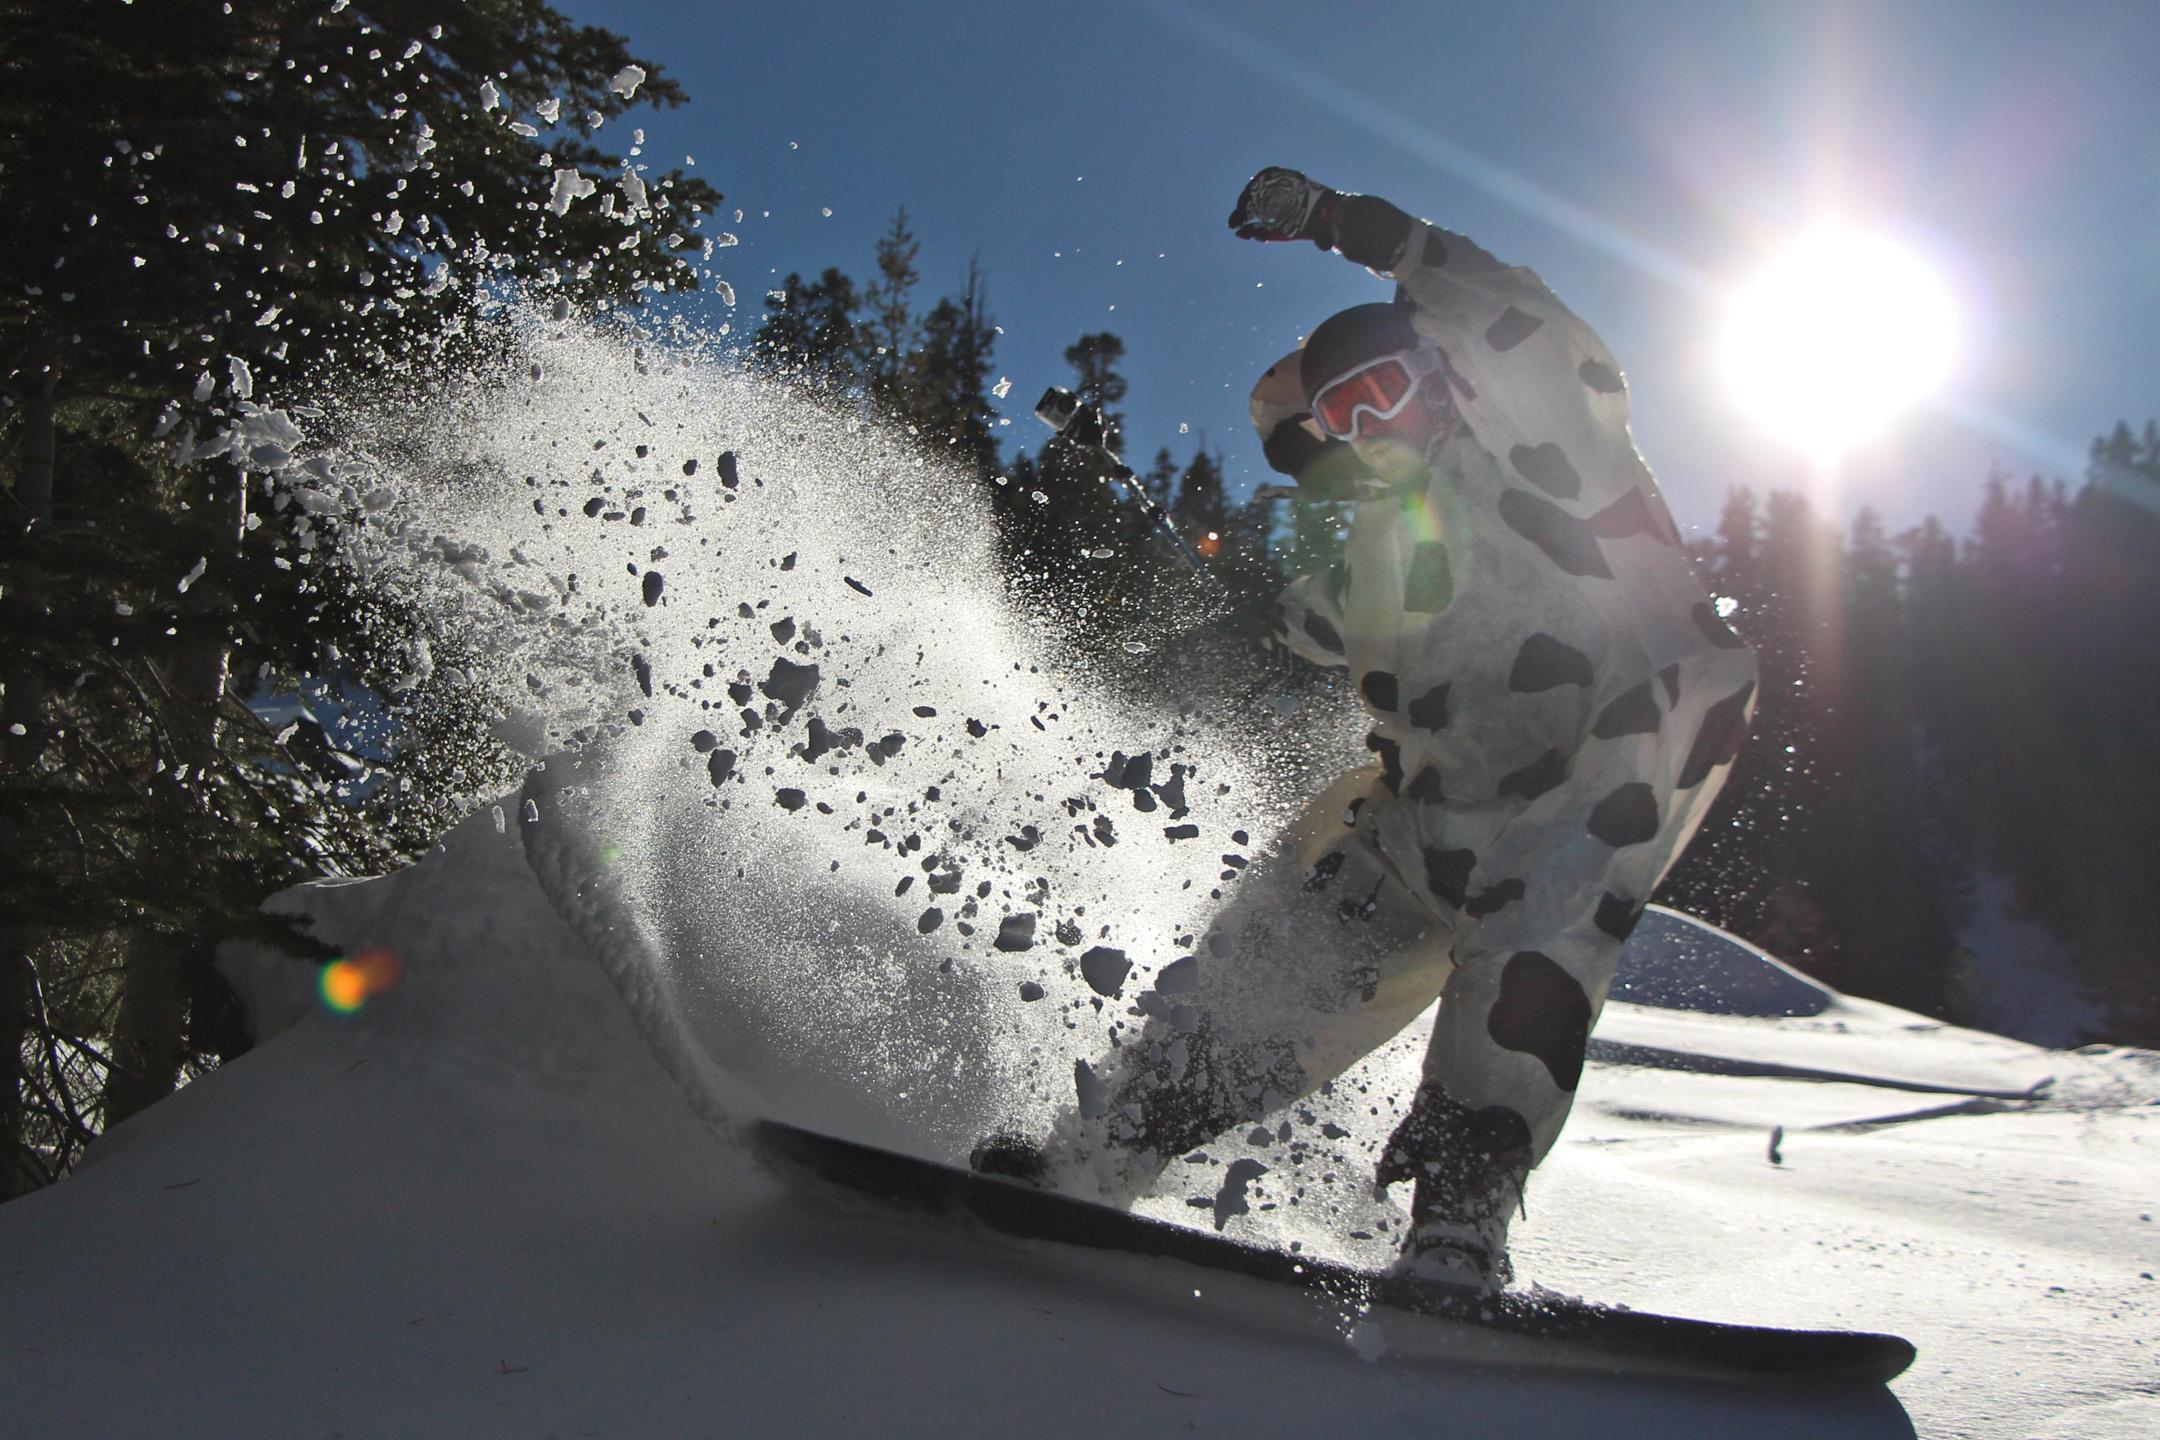 My friend Zach Zach, slashing backcountrypow in an inflatable cow suit.